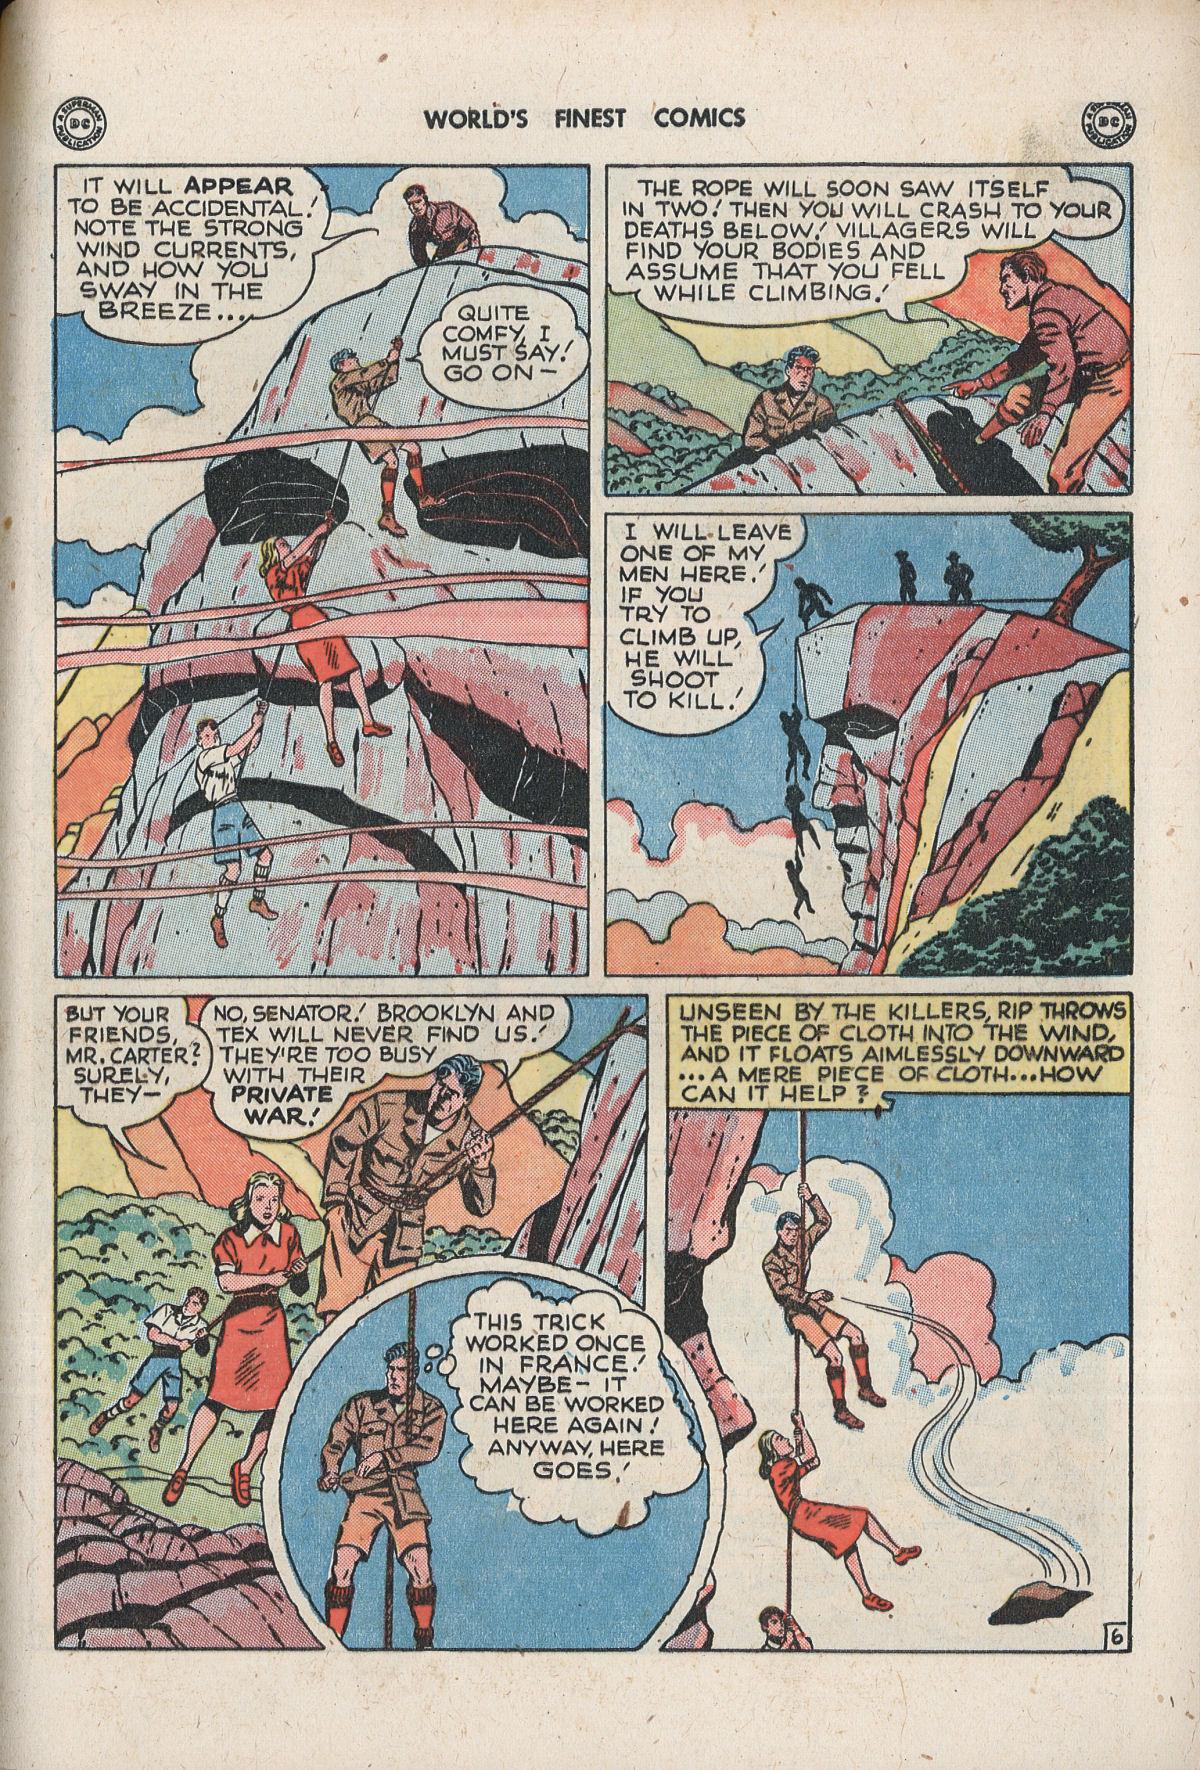 Read online World's Finest Comics comic -  Issue #33 - 53